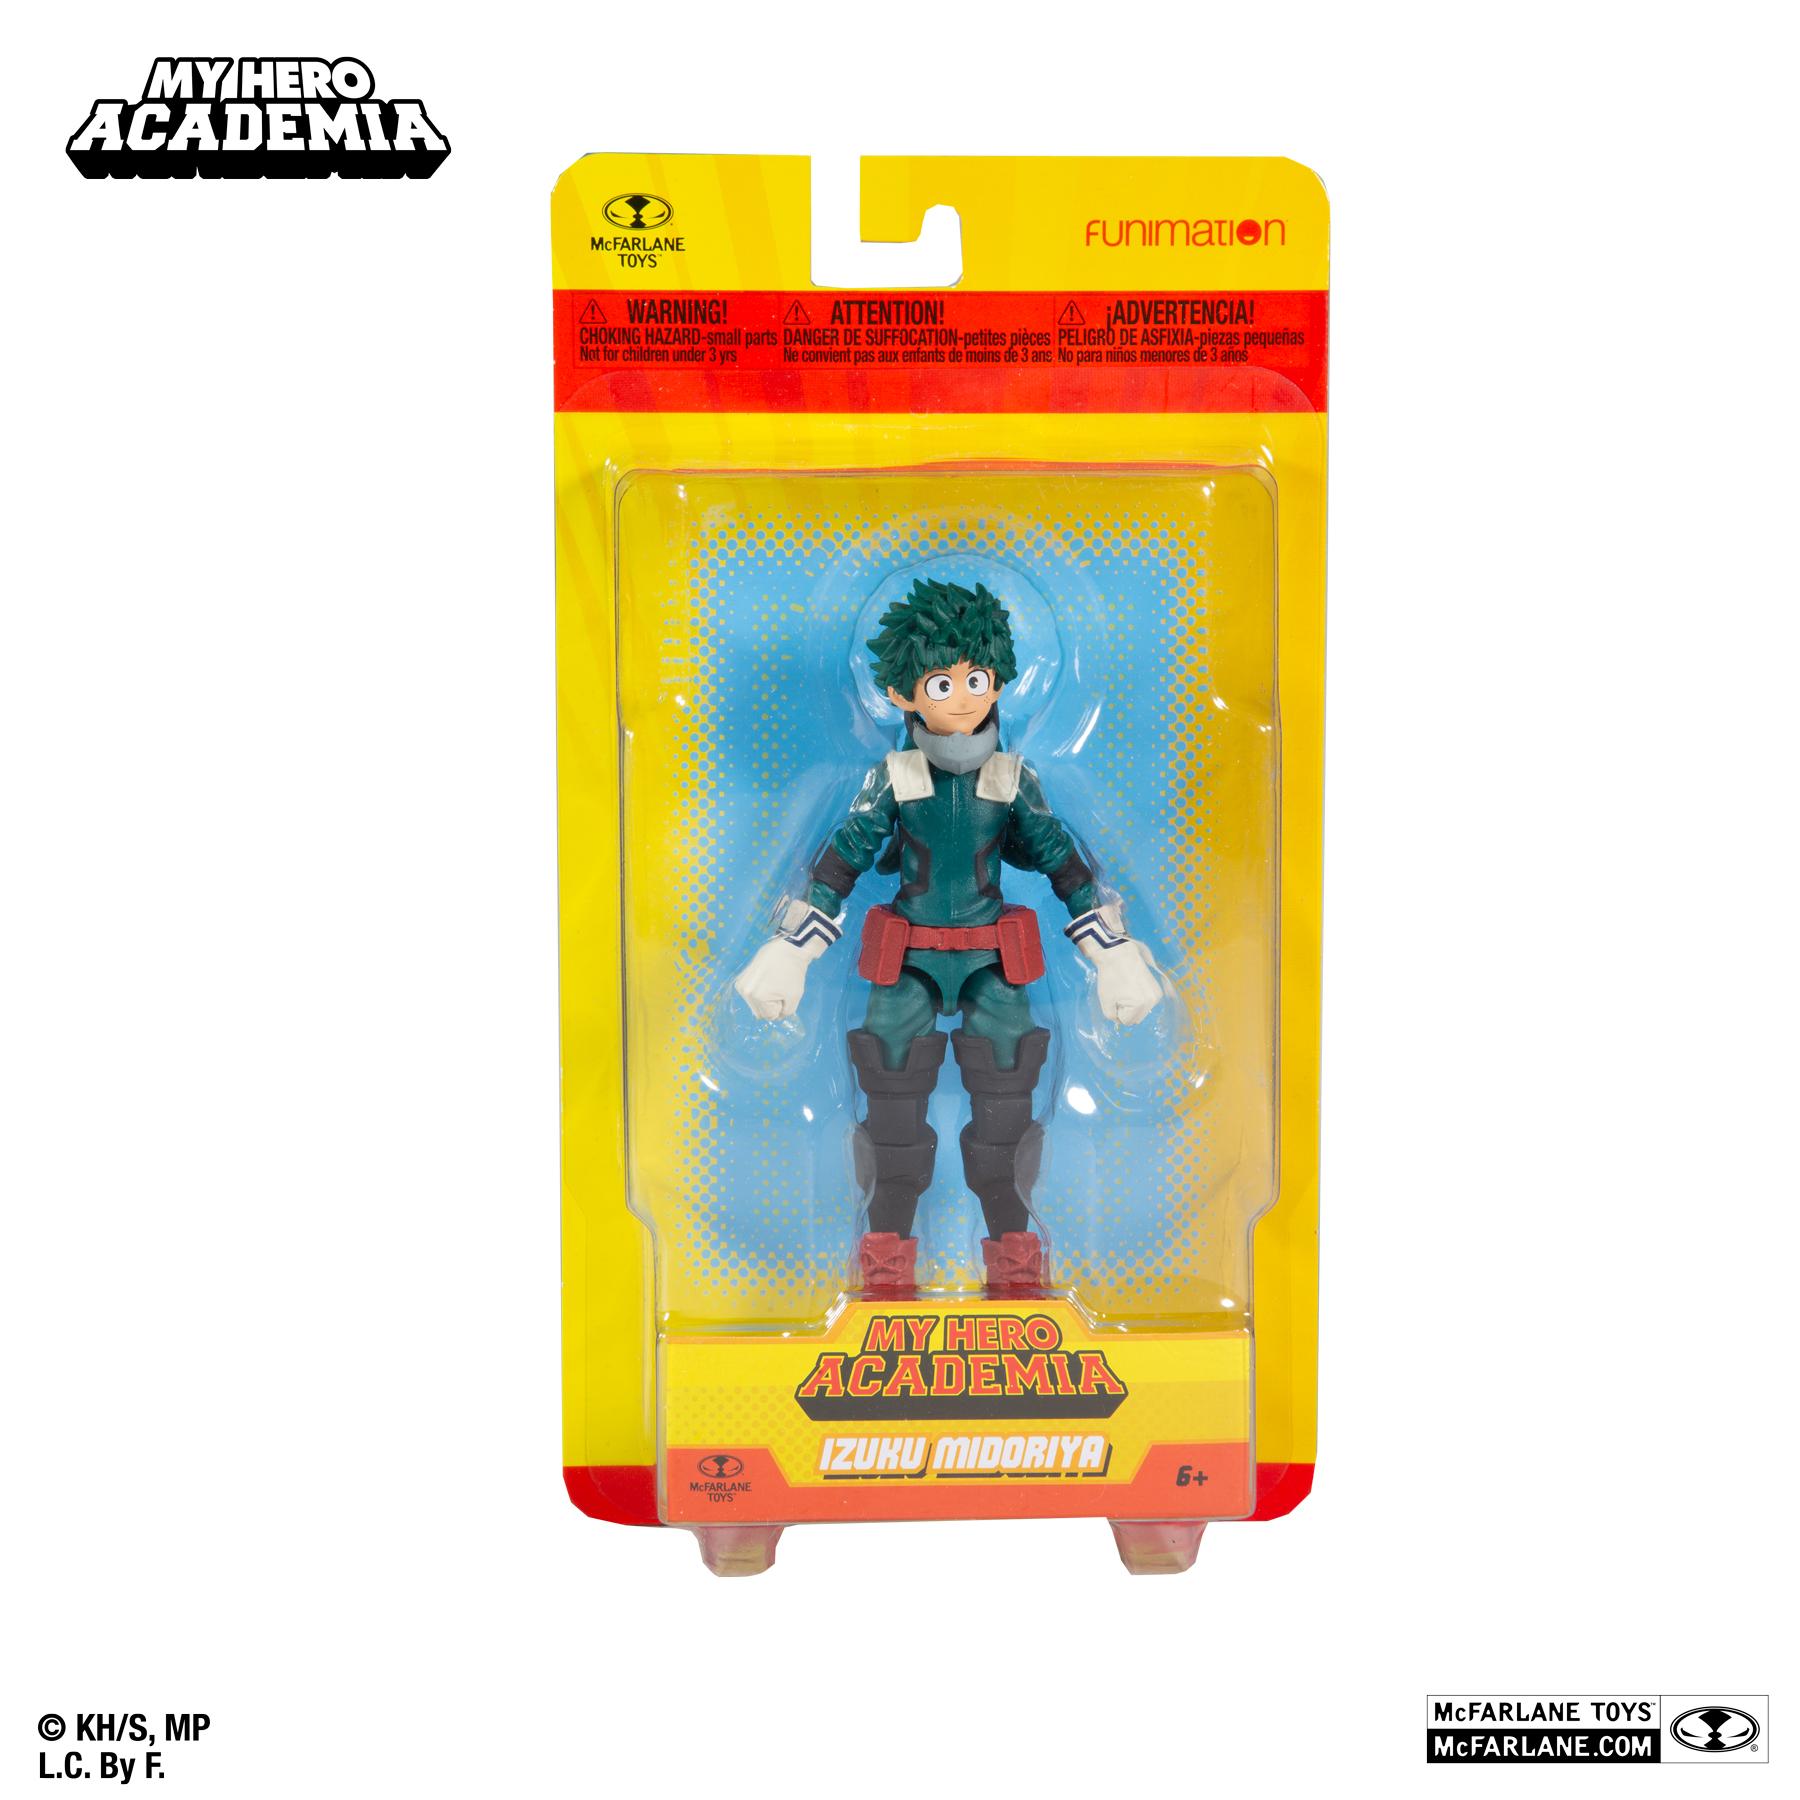 My Hero Academia - Izuku Midoriya 5 Inch Figure